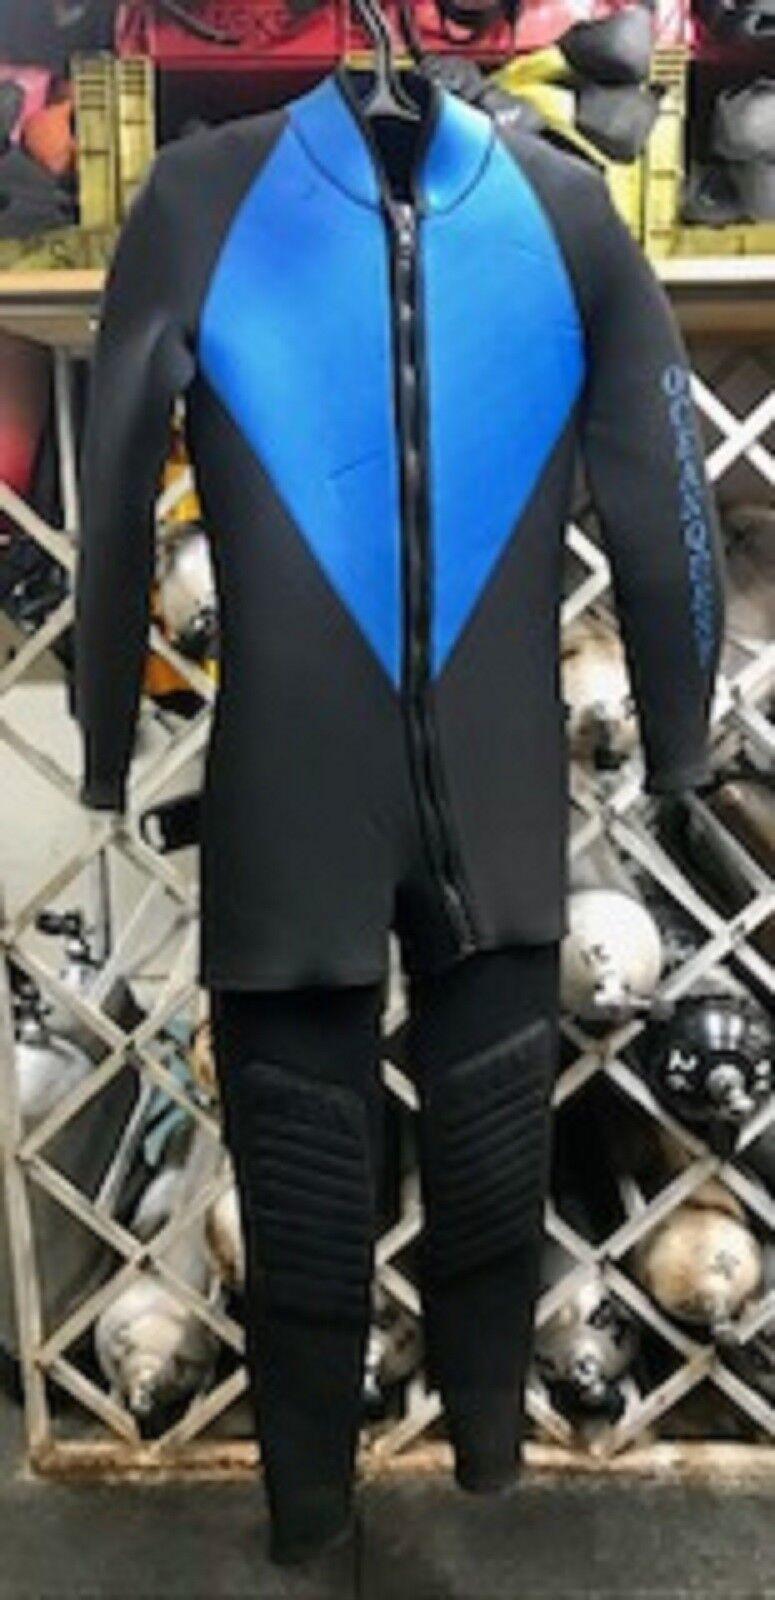 USED- OceanQuest, Men's, 5 mm-  Two Piece Wet suit (Medium)  cheap